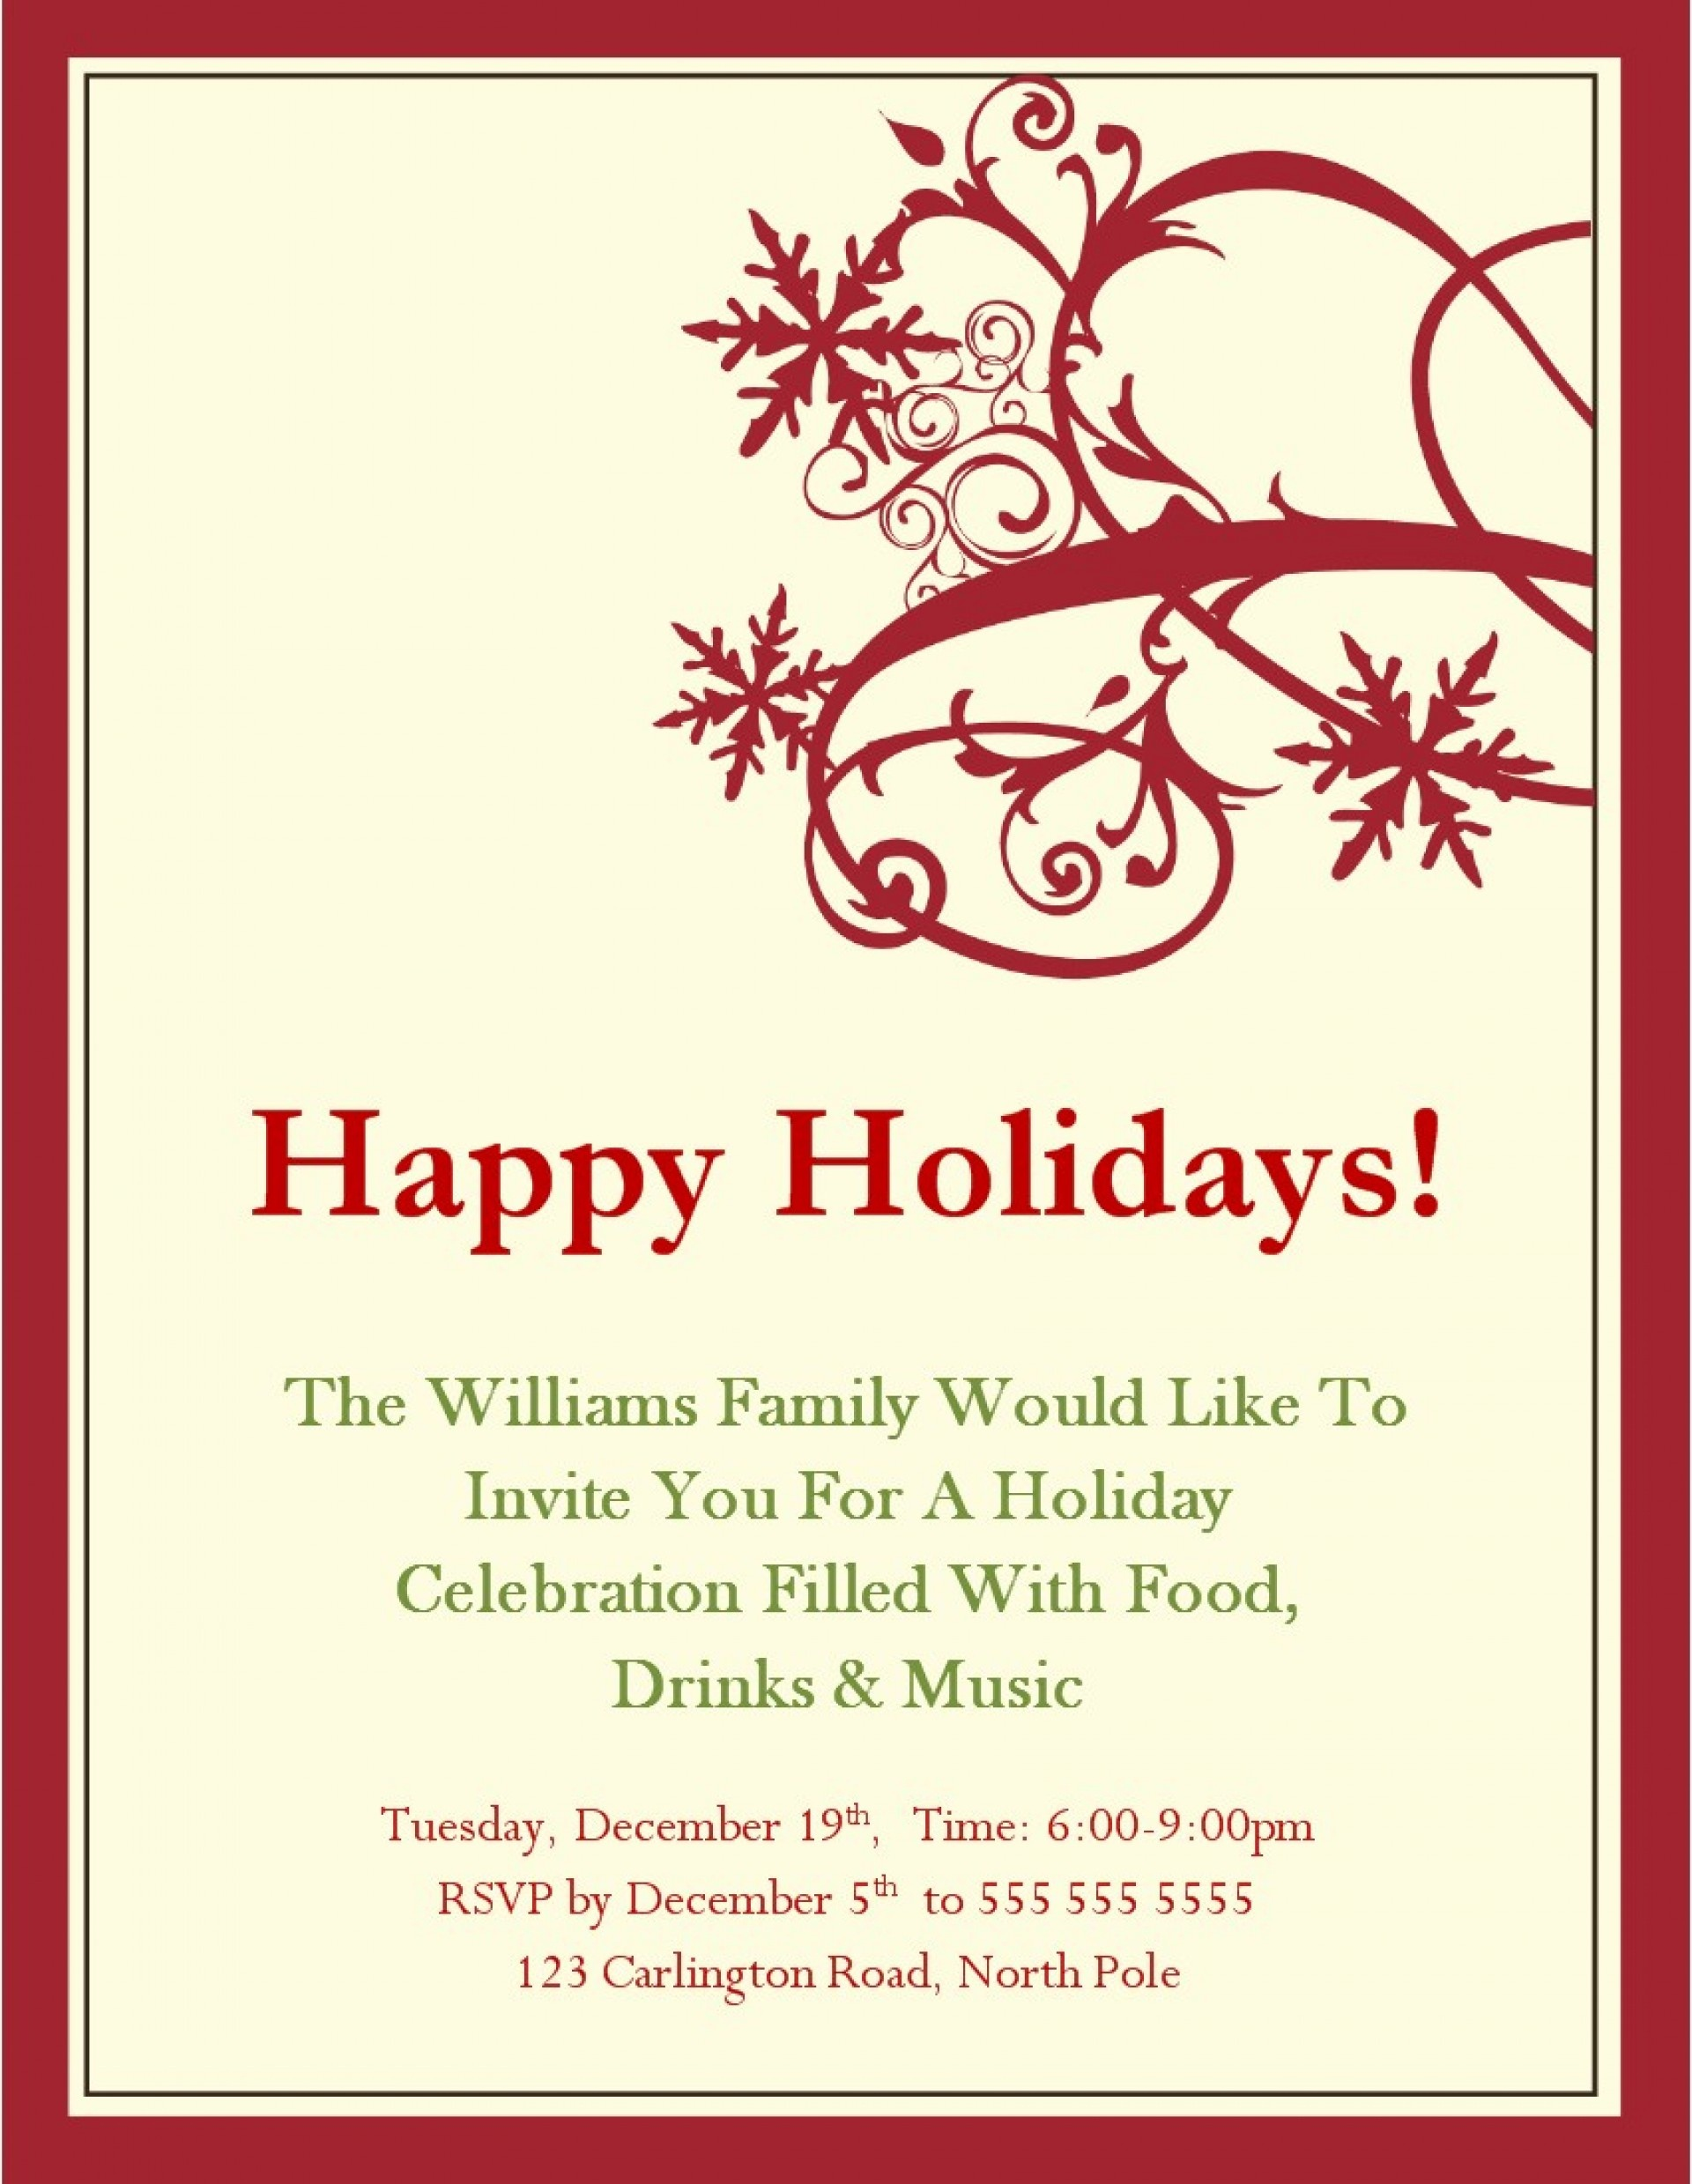 005 Template Ideas Free Holiday Invitation Templates Christmas Party - Holiday Invitations Free Printable